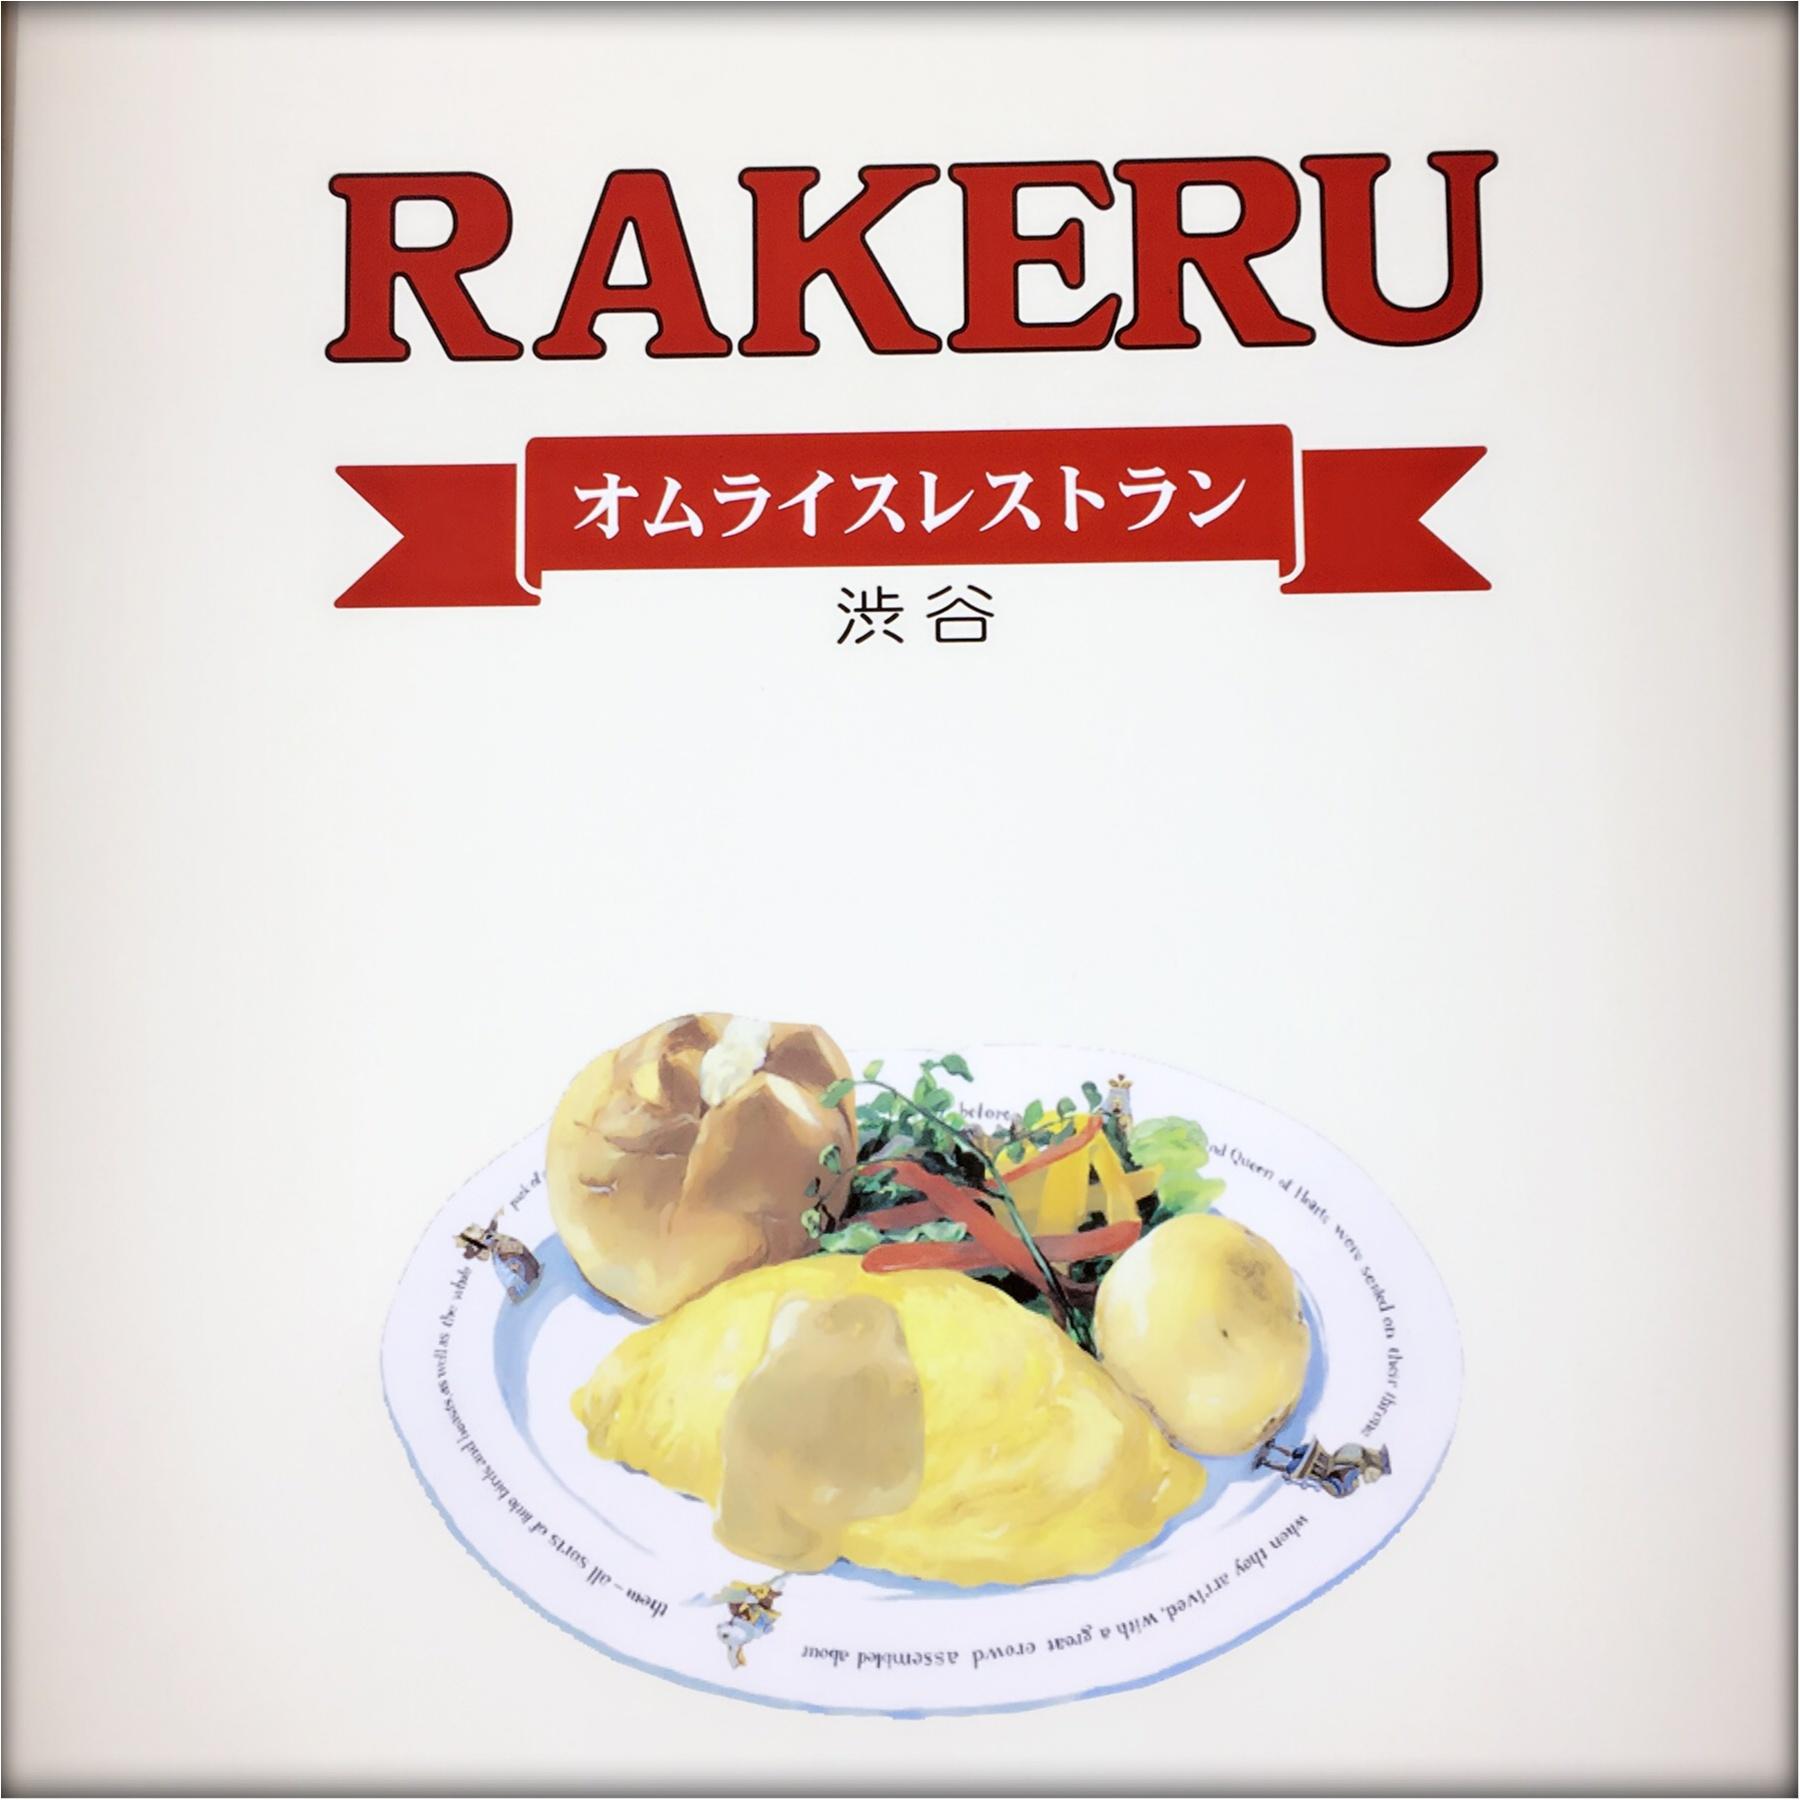 …ஐ 絶品ふわとろオムライス♥️数々の雑誌に取り上げられる老舗店【RAKERU】のランチレポ♪  ஐ¨_5